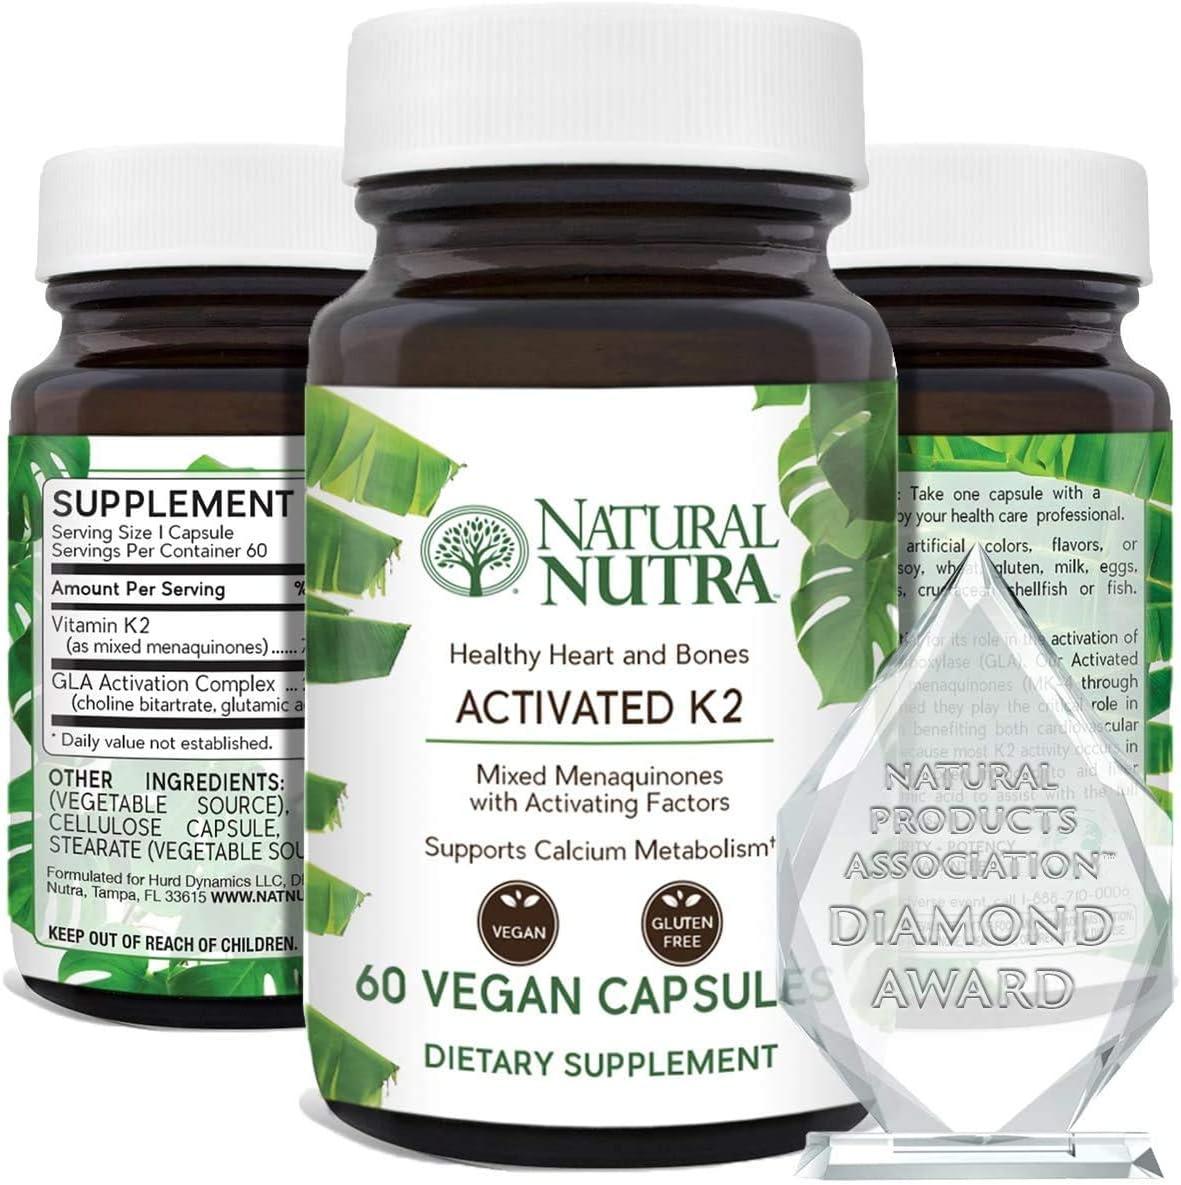 Natural Nutra Very popular Full Spectrum Vitamin K2 Supplement MK7 Pl to MK4 Miami Mall